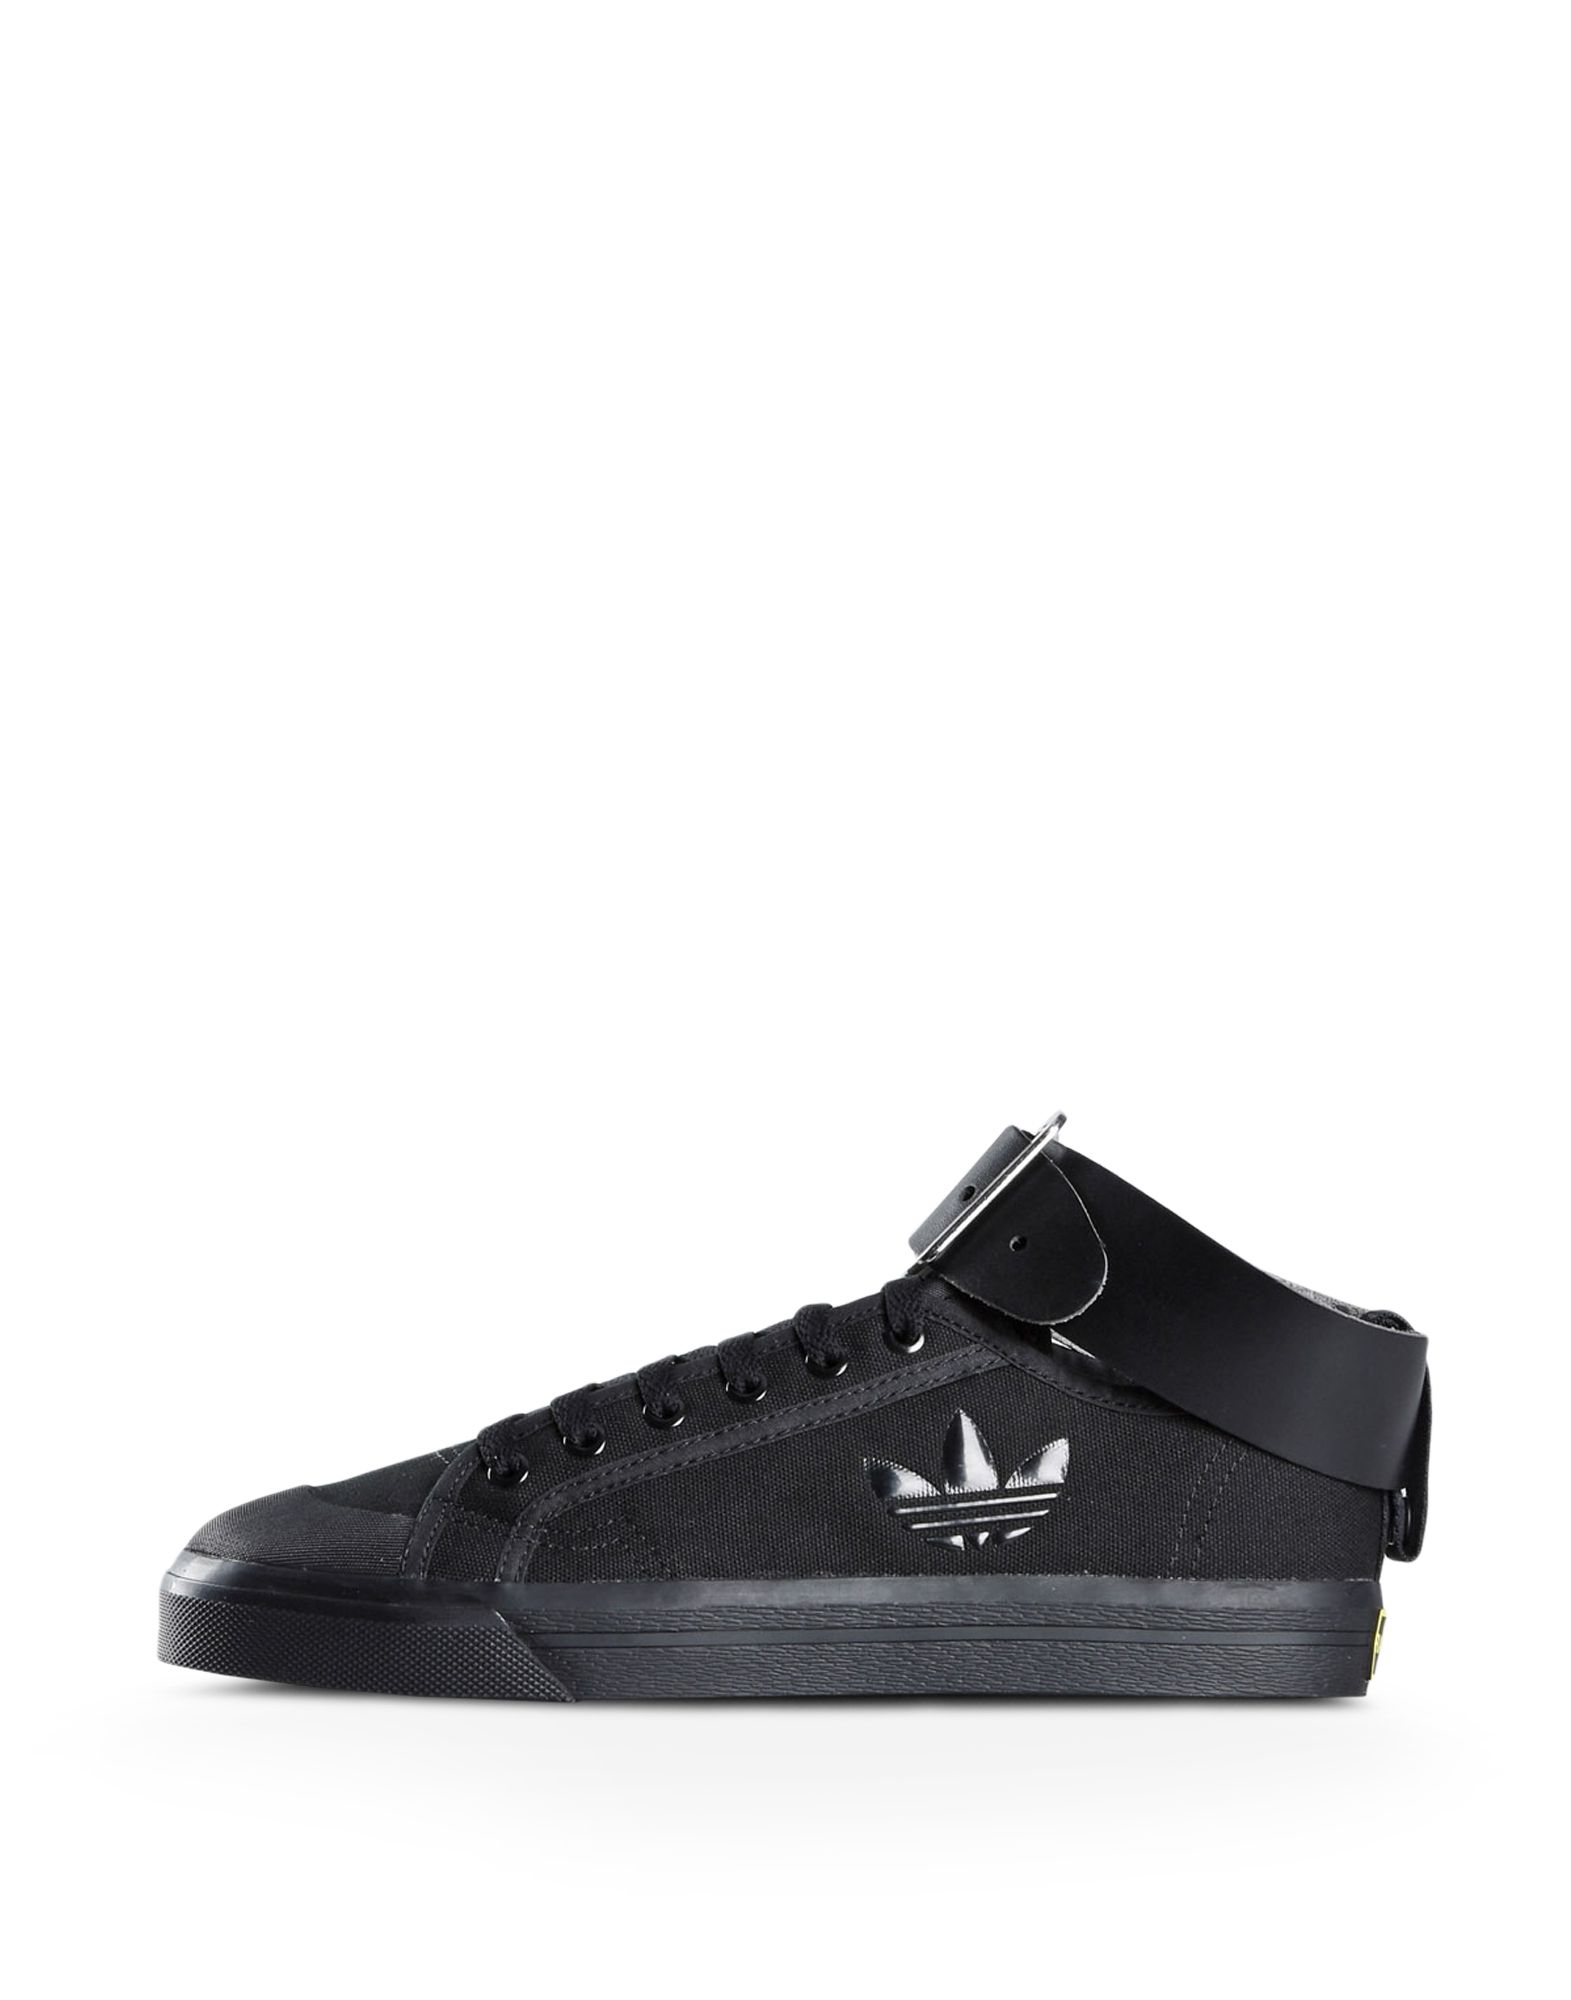 Adidas Par Baskets Raf Esprit De Simons - Noir VmKxL